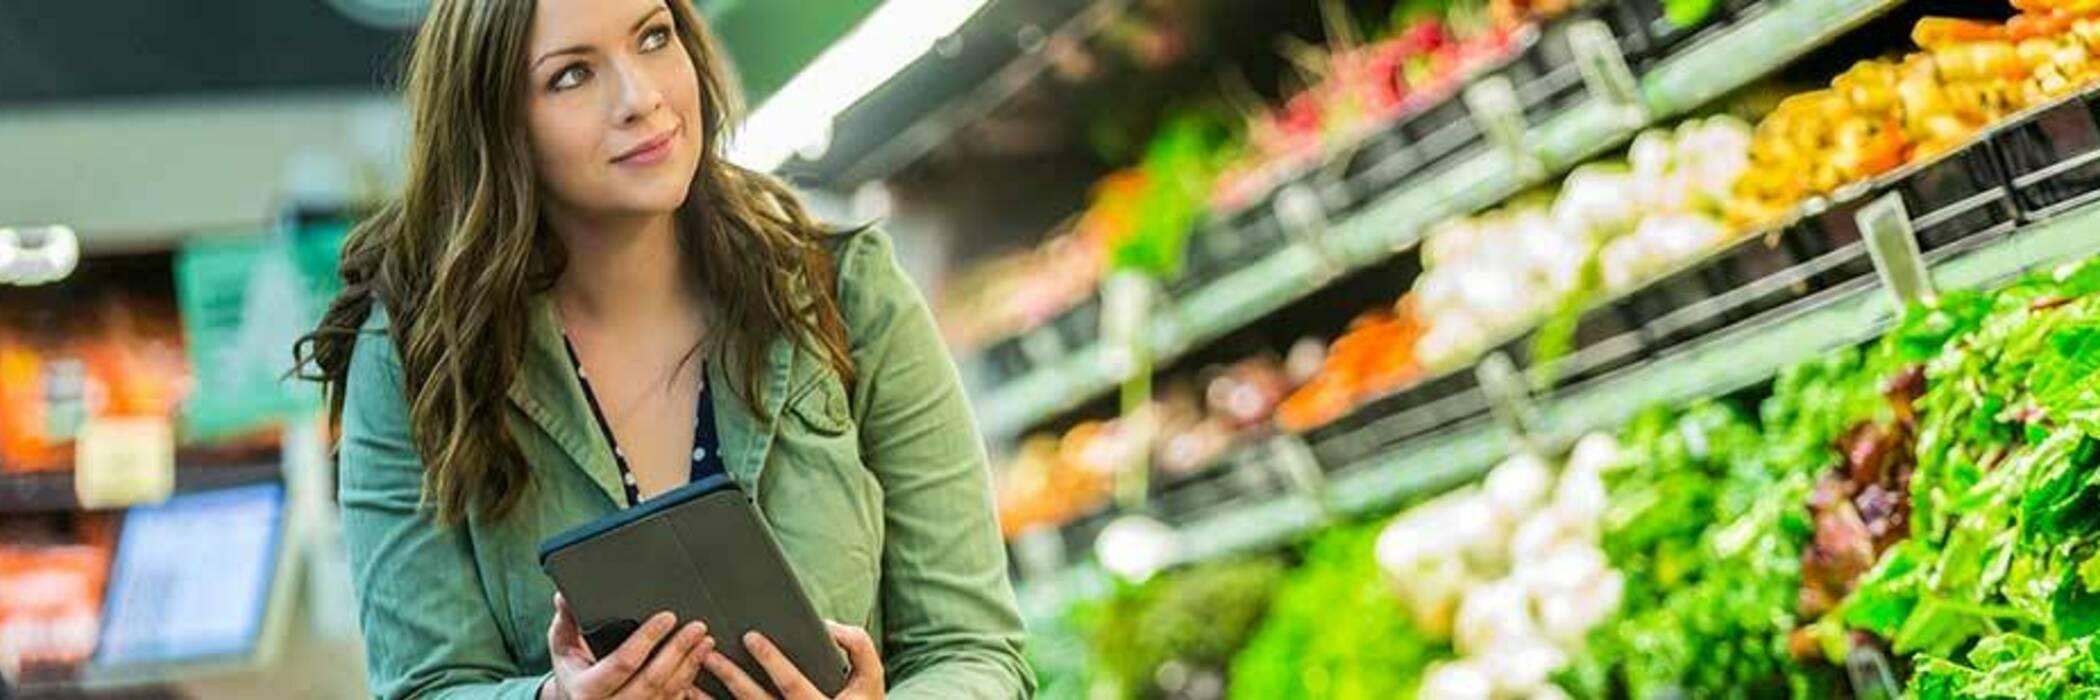 Woman doing grocery shopping.